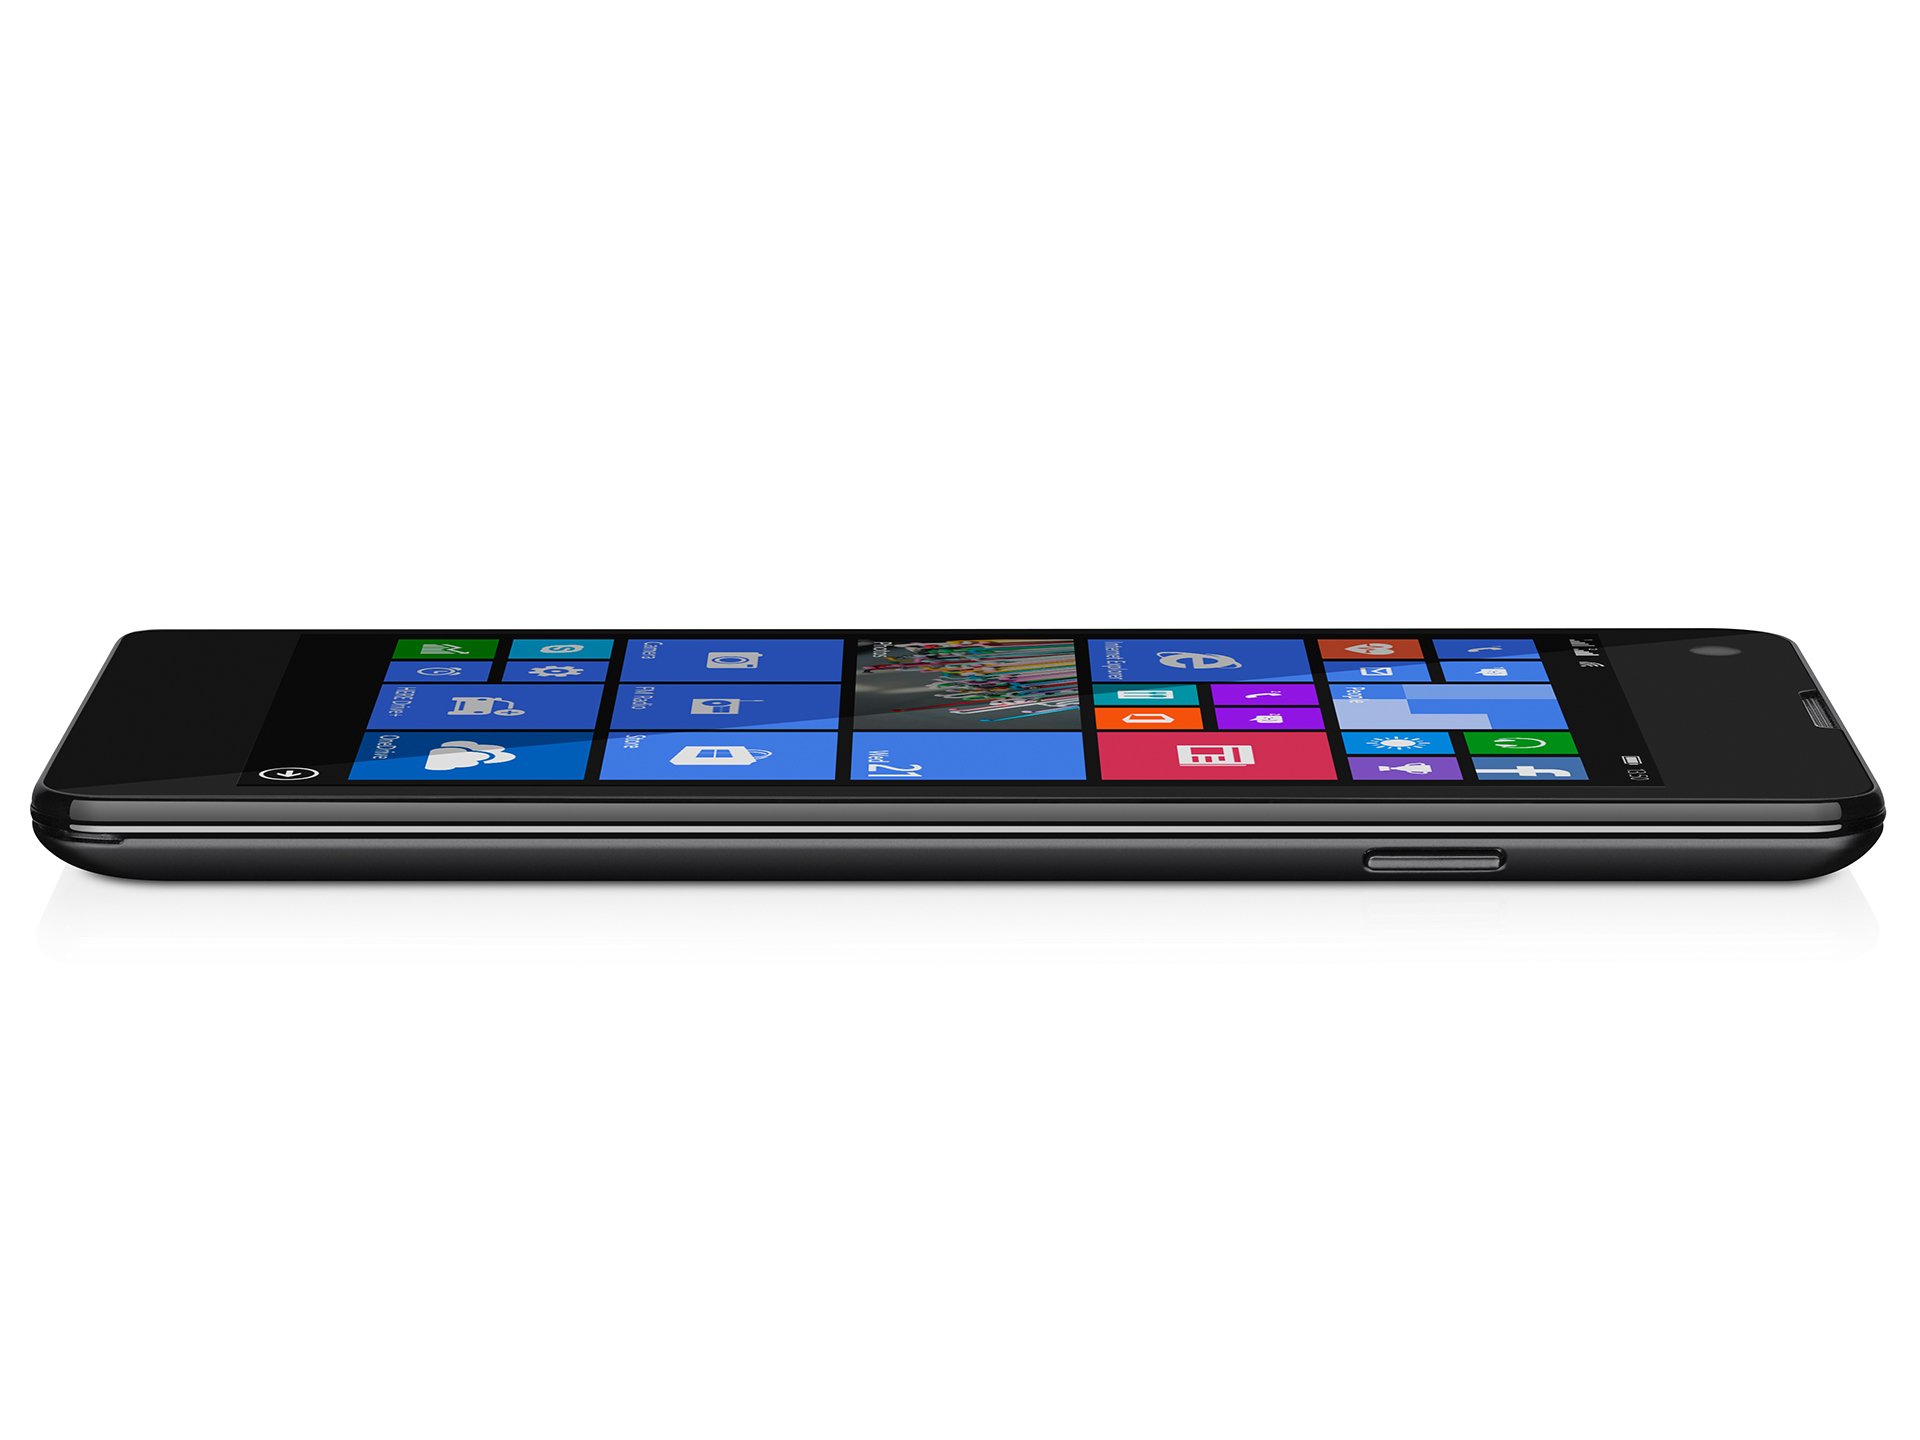 Test Trekstor WinPhone 4.7 HD Smartphone